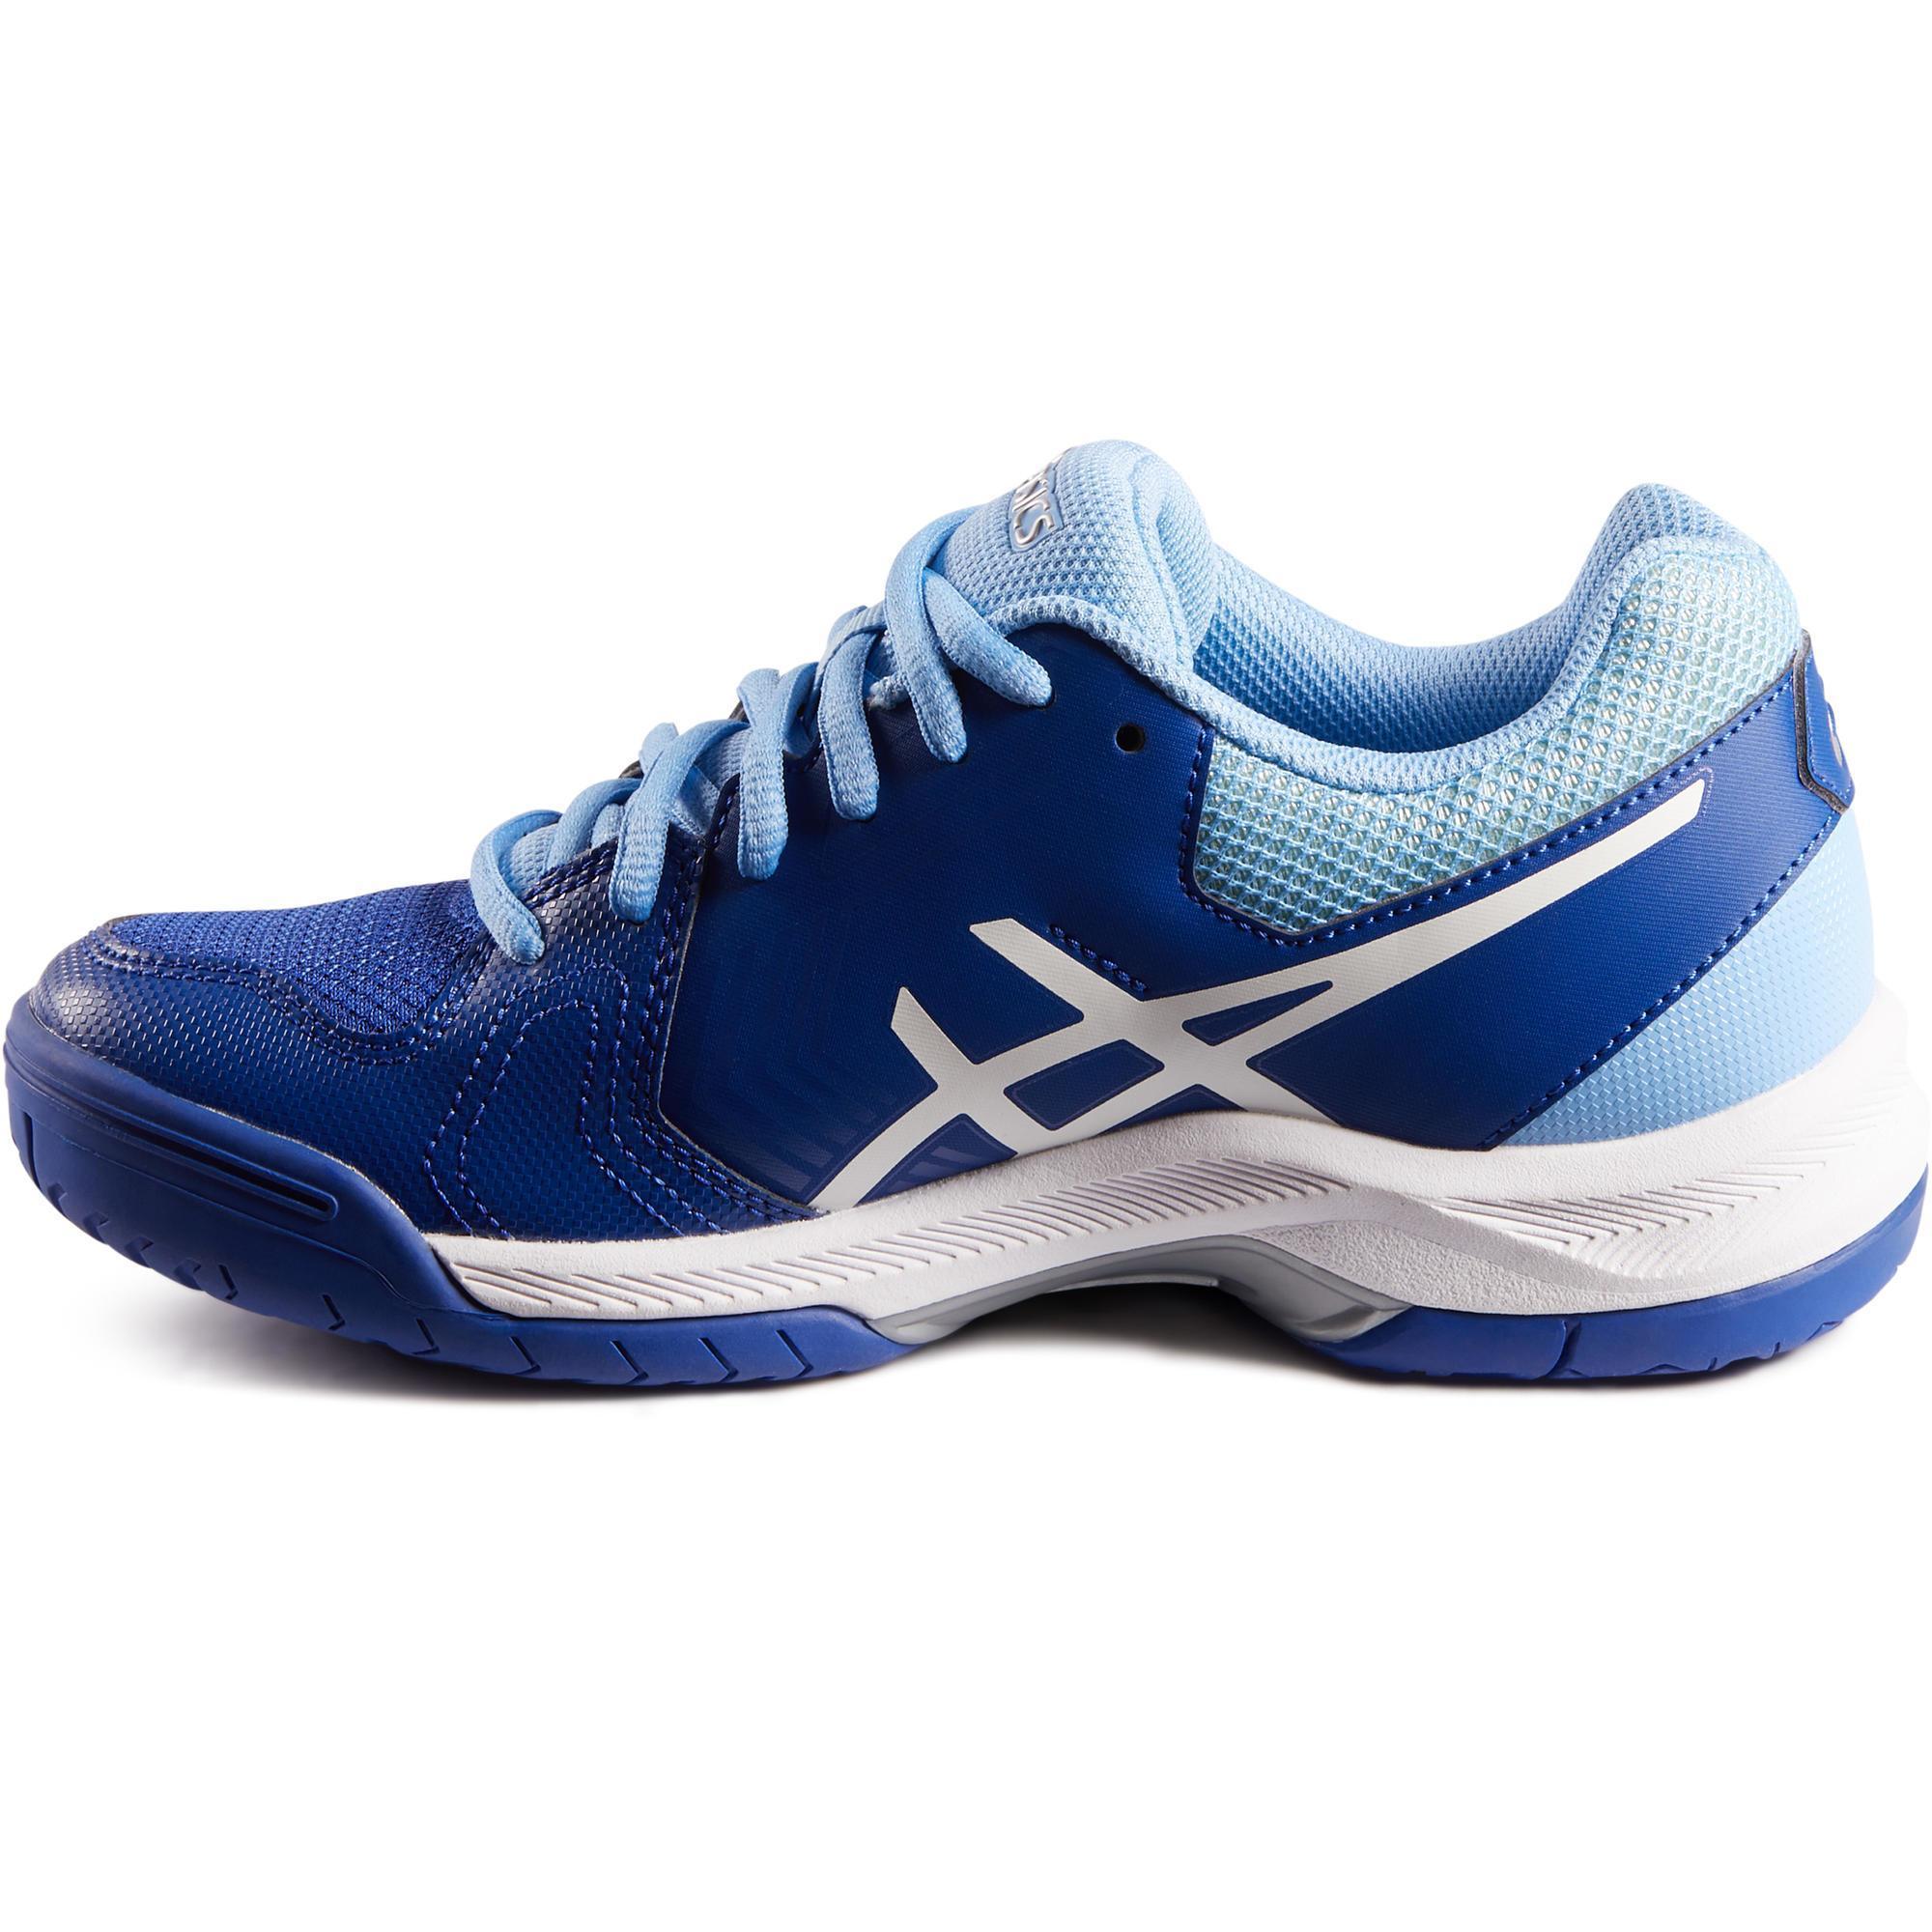 8e841ed9159c9 Bleue Dedicate Femme Chaussure Gel Decathlon Asics De Tennis CYPwnXq ...